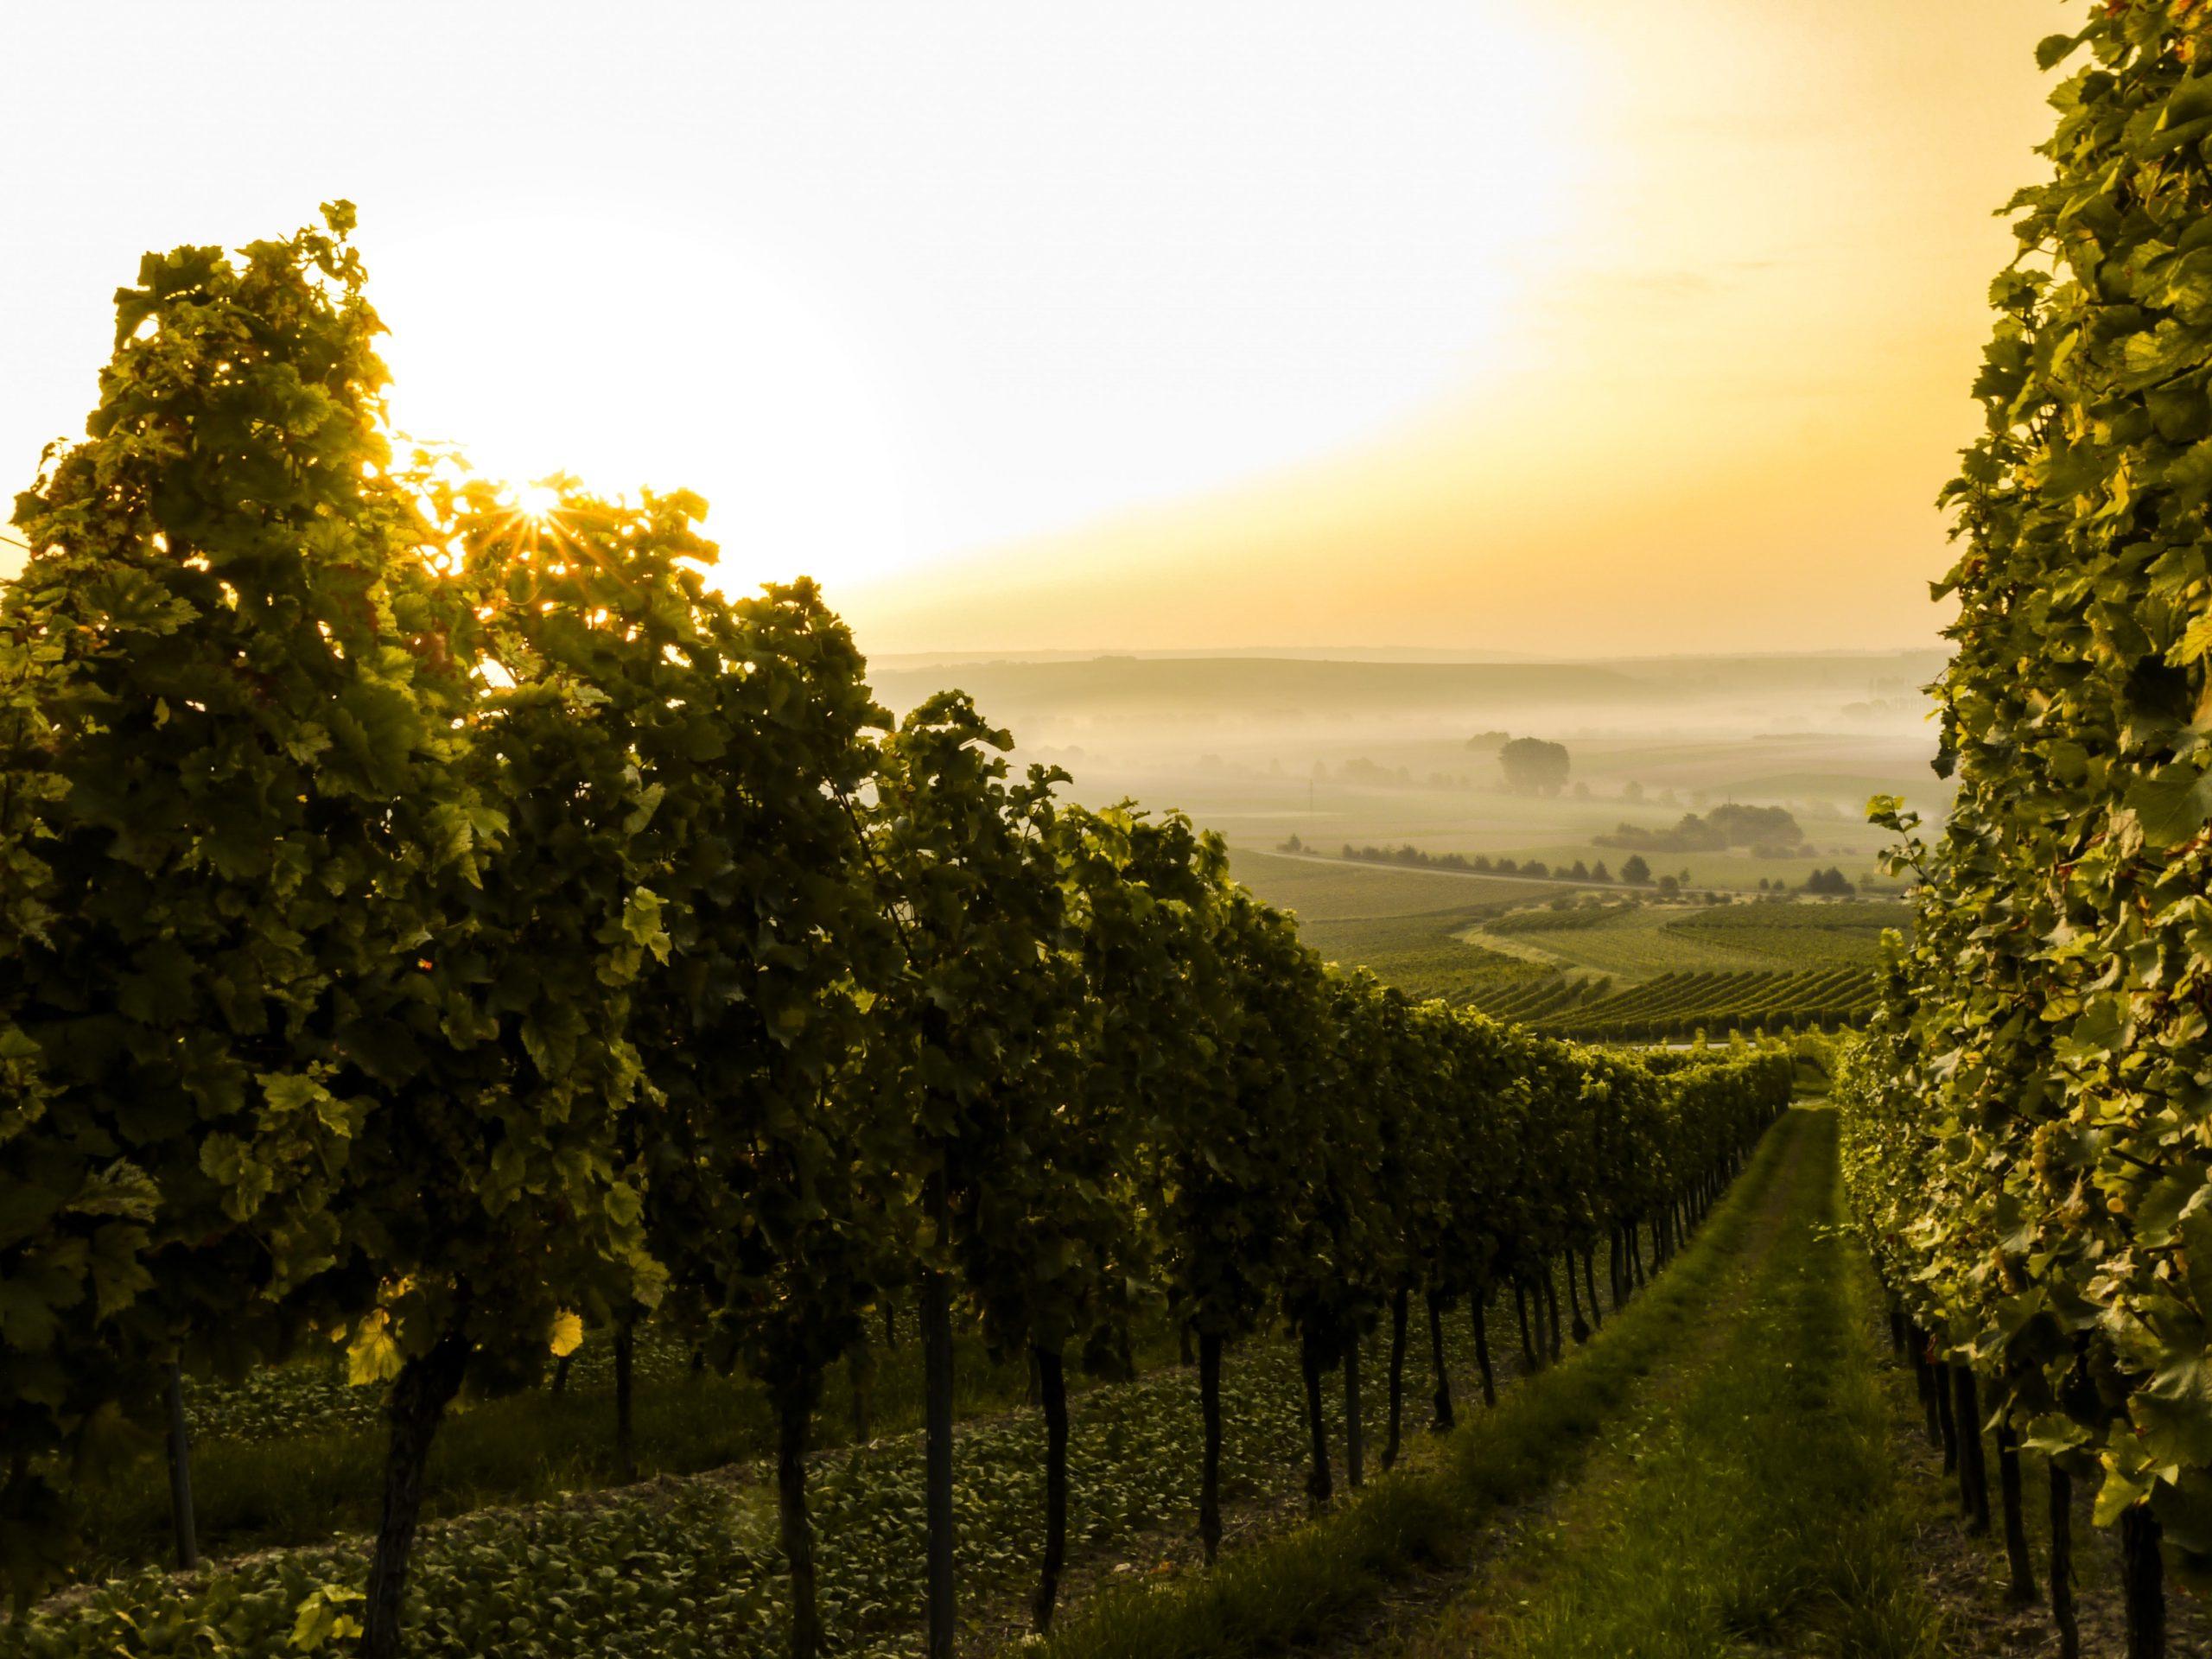 long stretch of vineyards